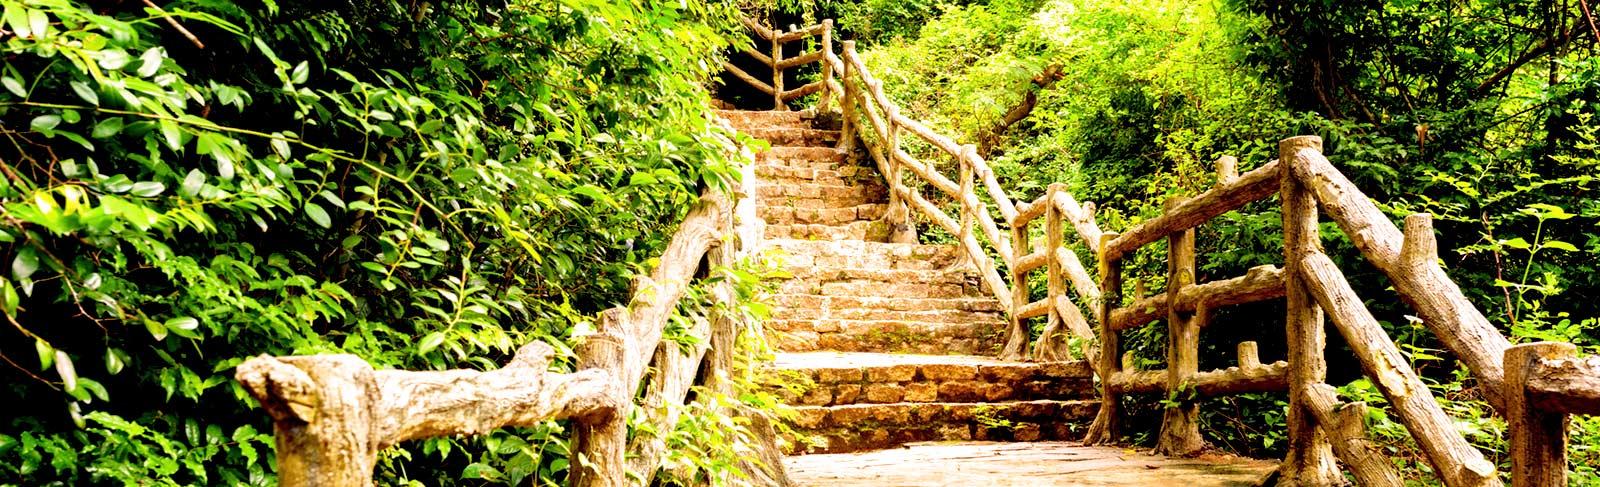 Holztreppe im Wald